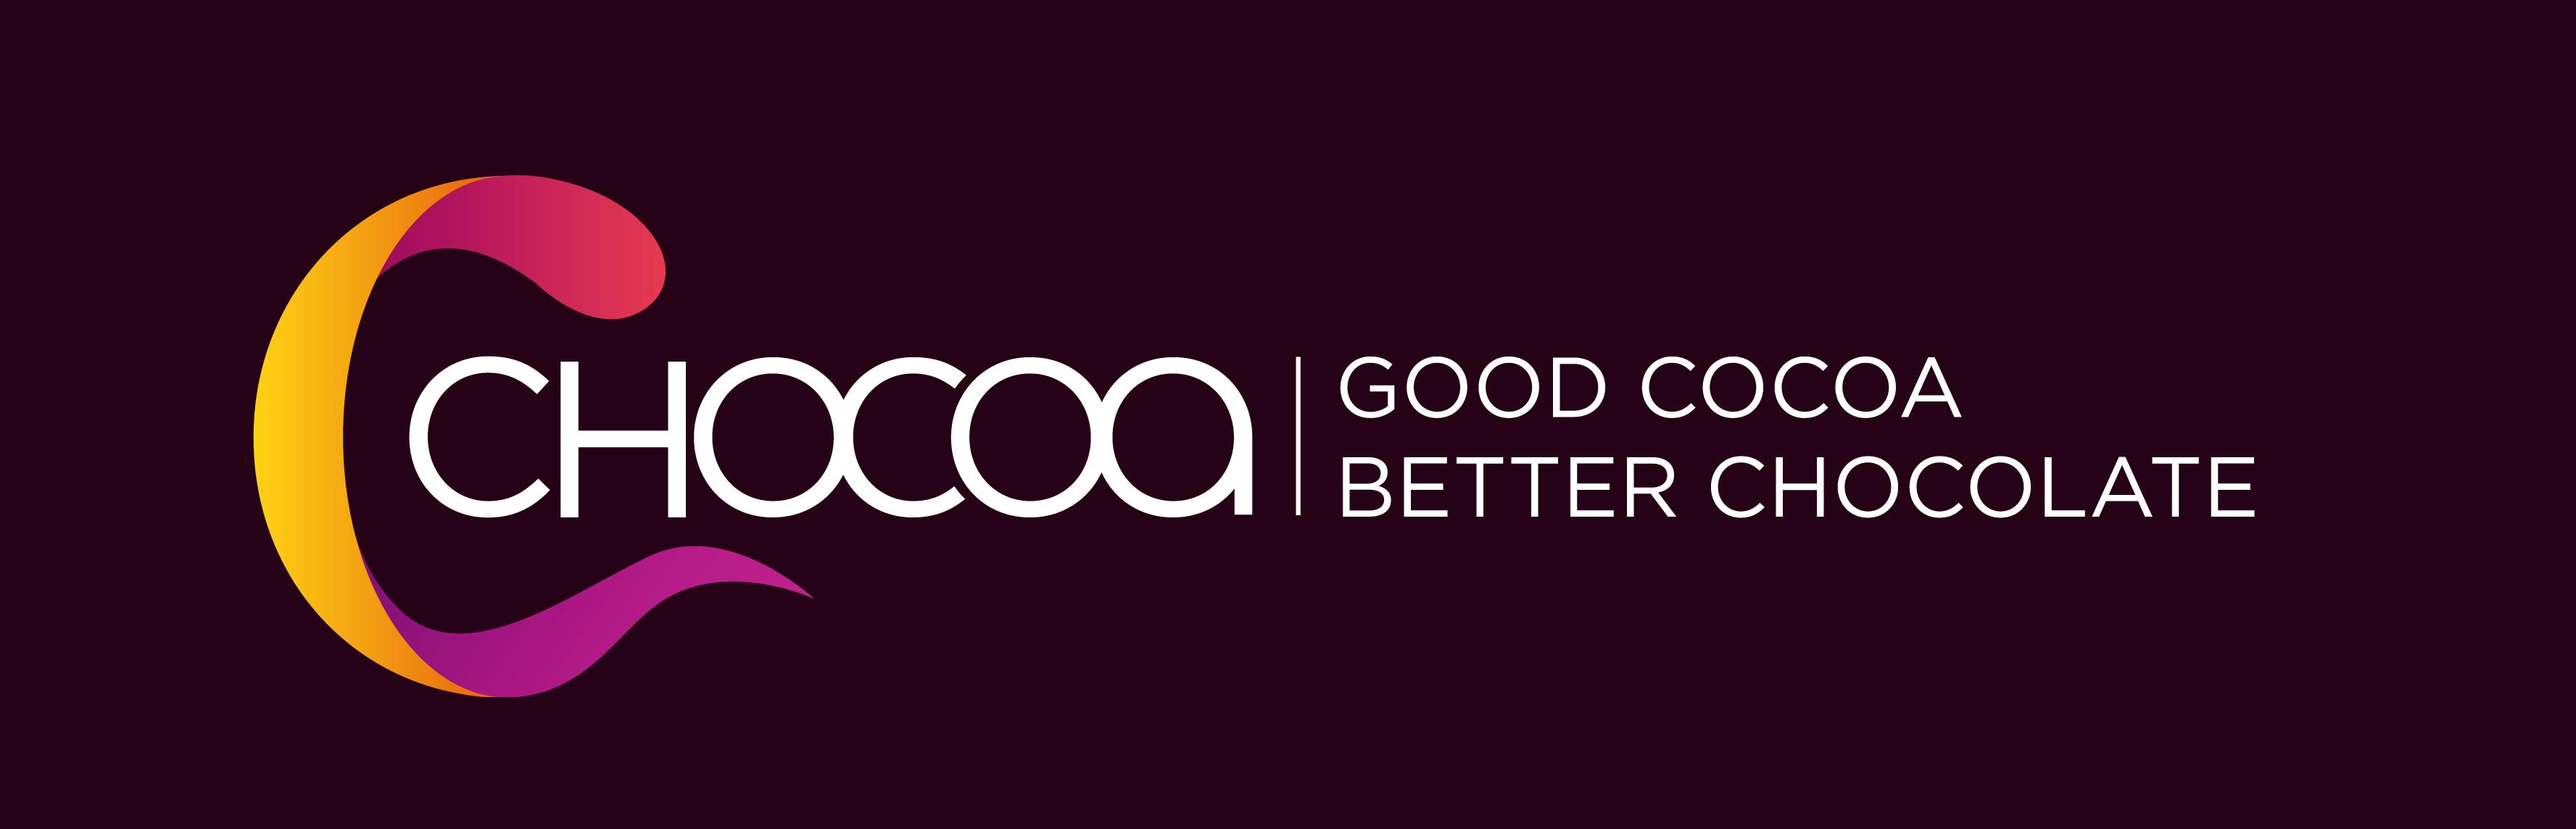 chocoa festival logo good caao better chocoalte